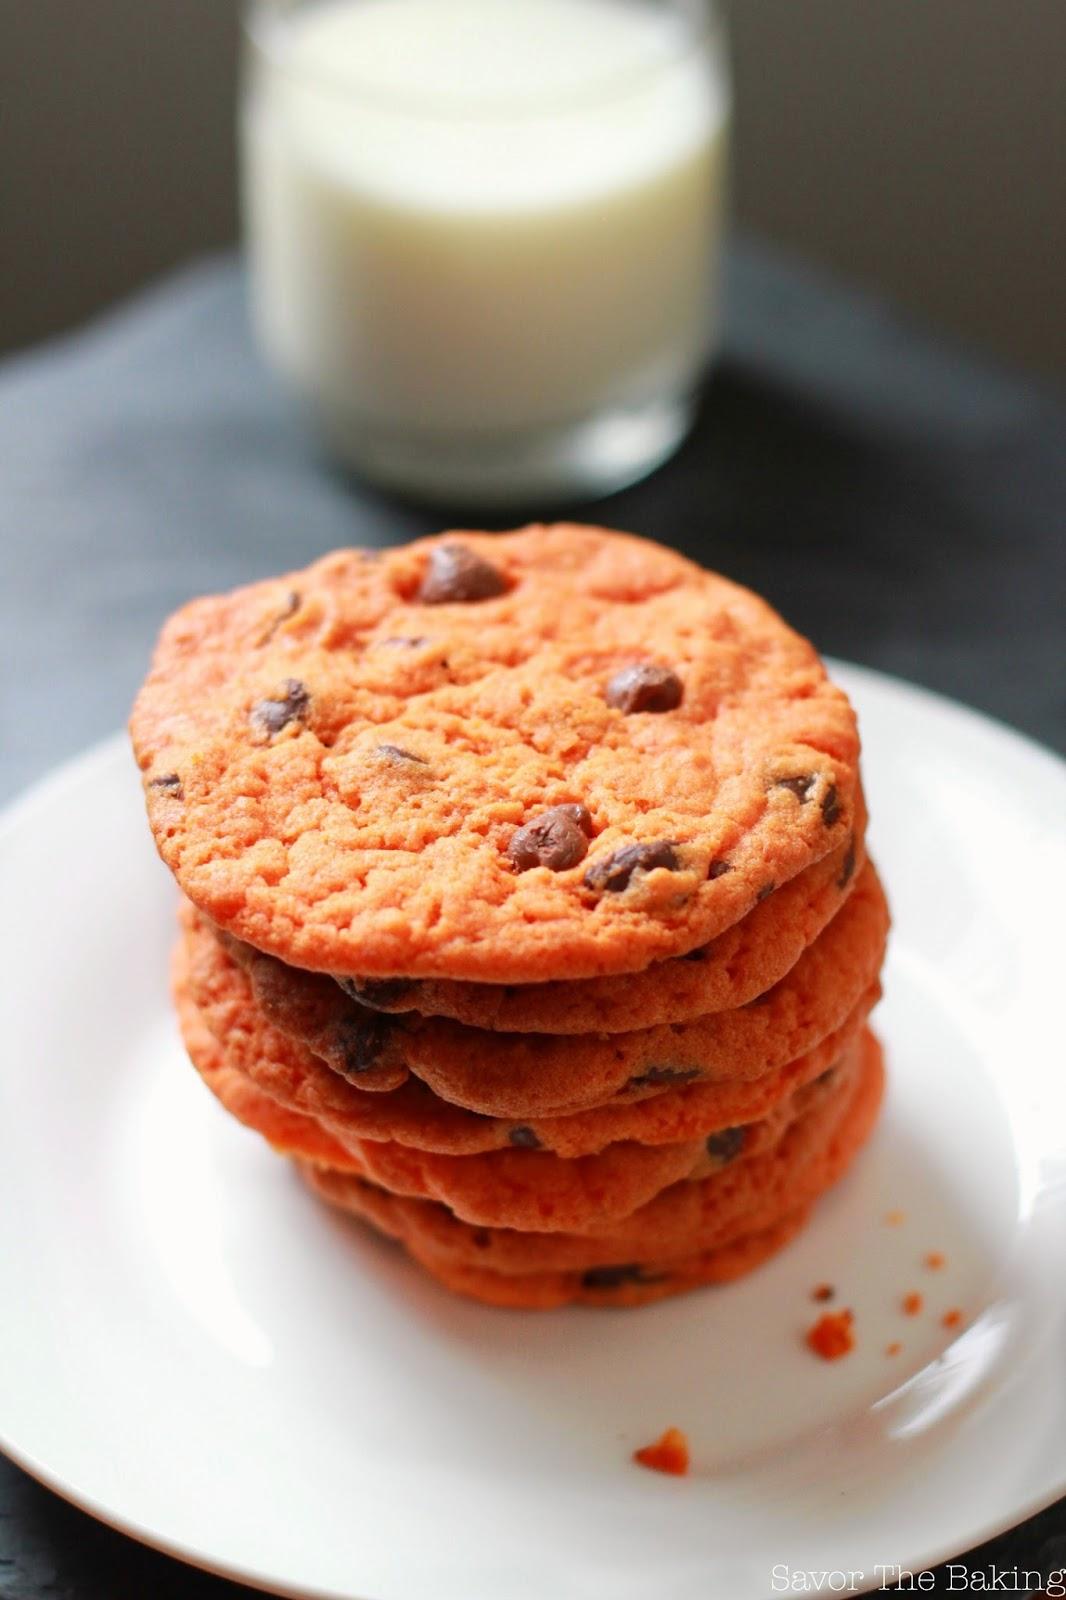 savor the baking: halloween chocolate chip cookies